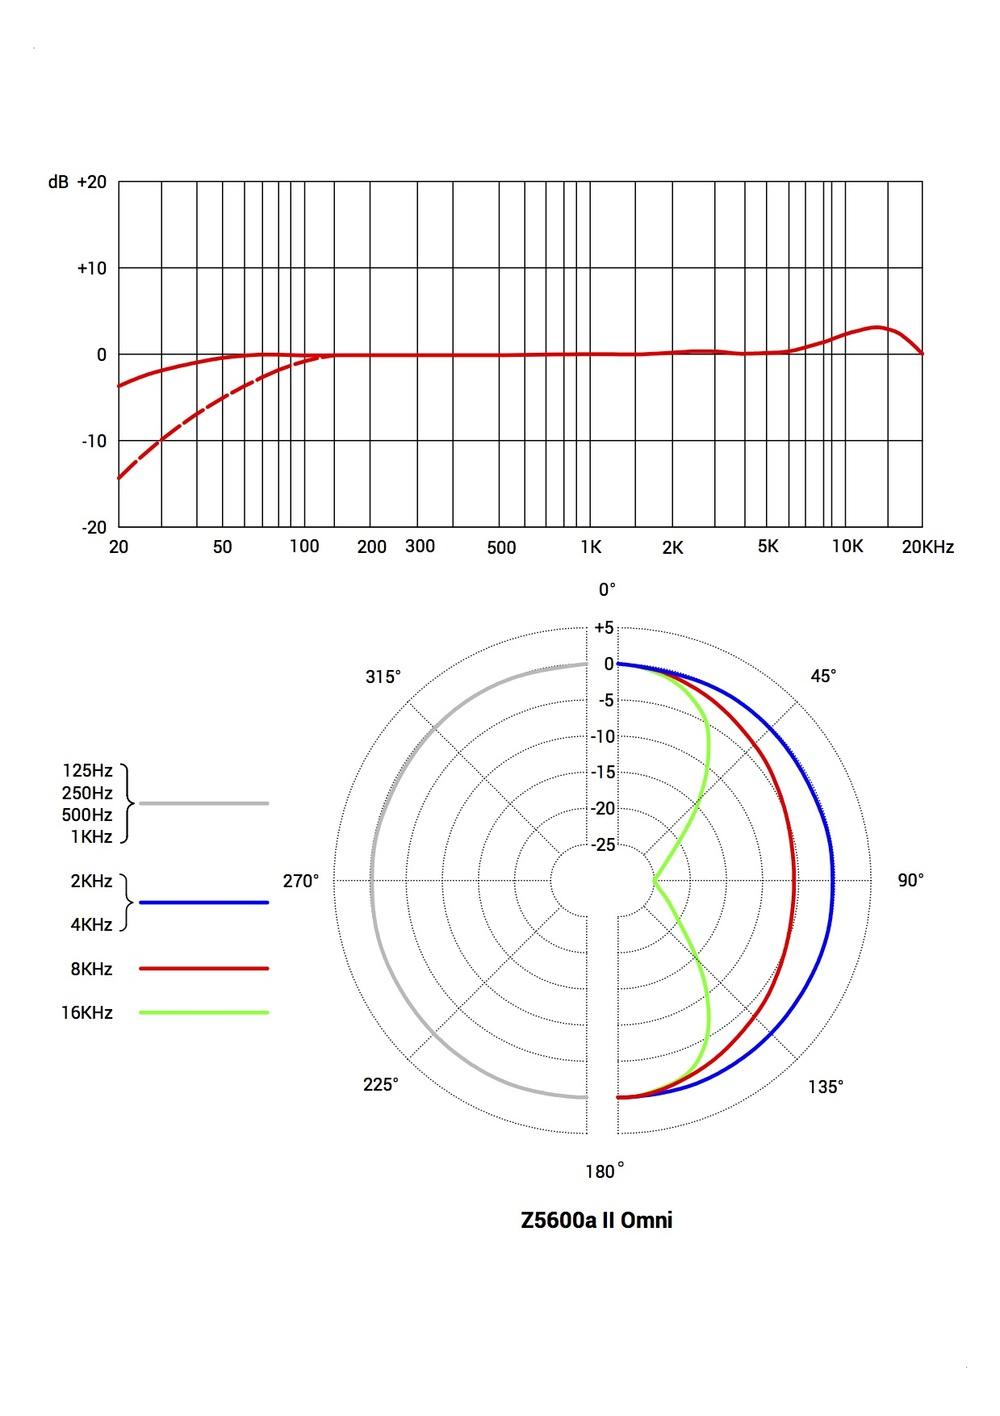 Z5600a II Omni.jpg